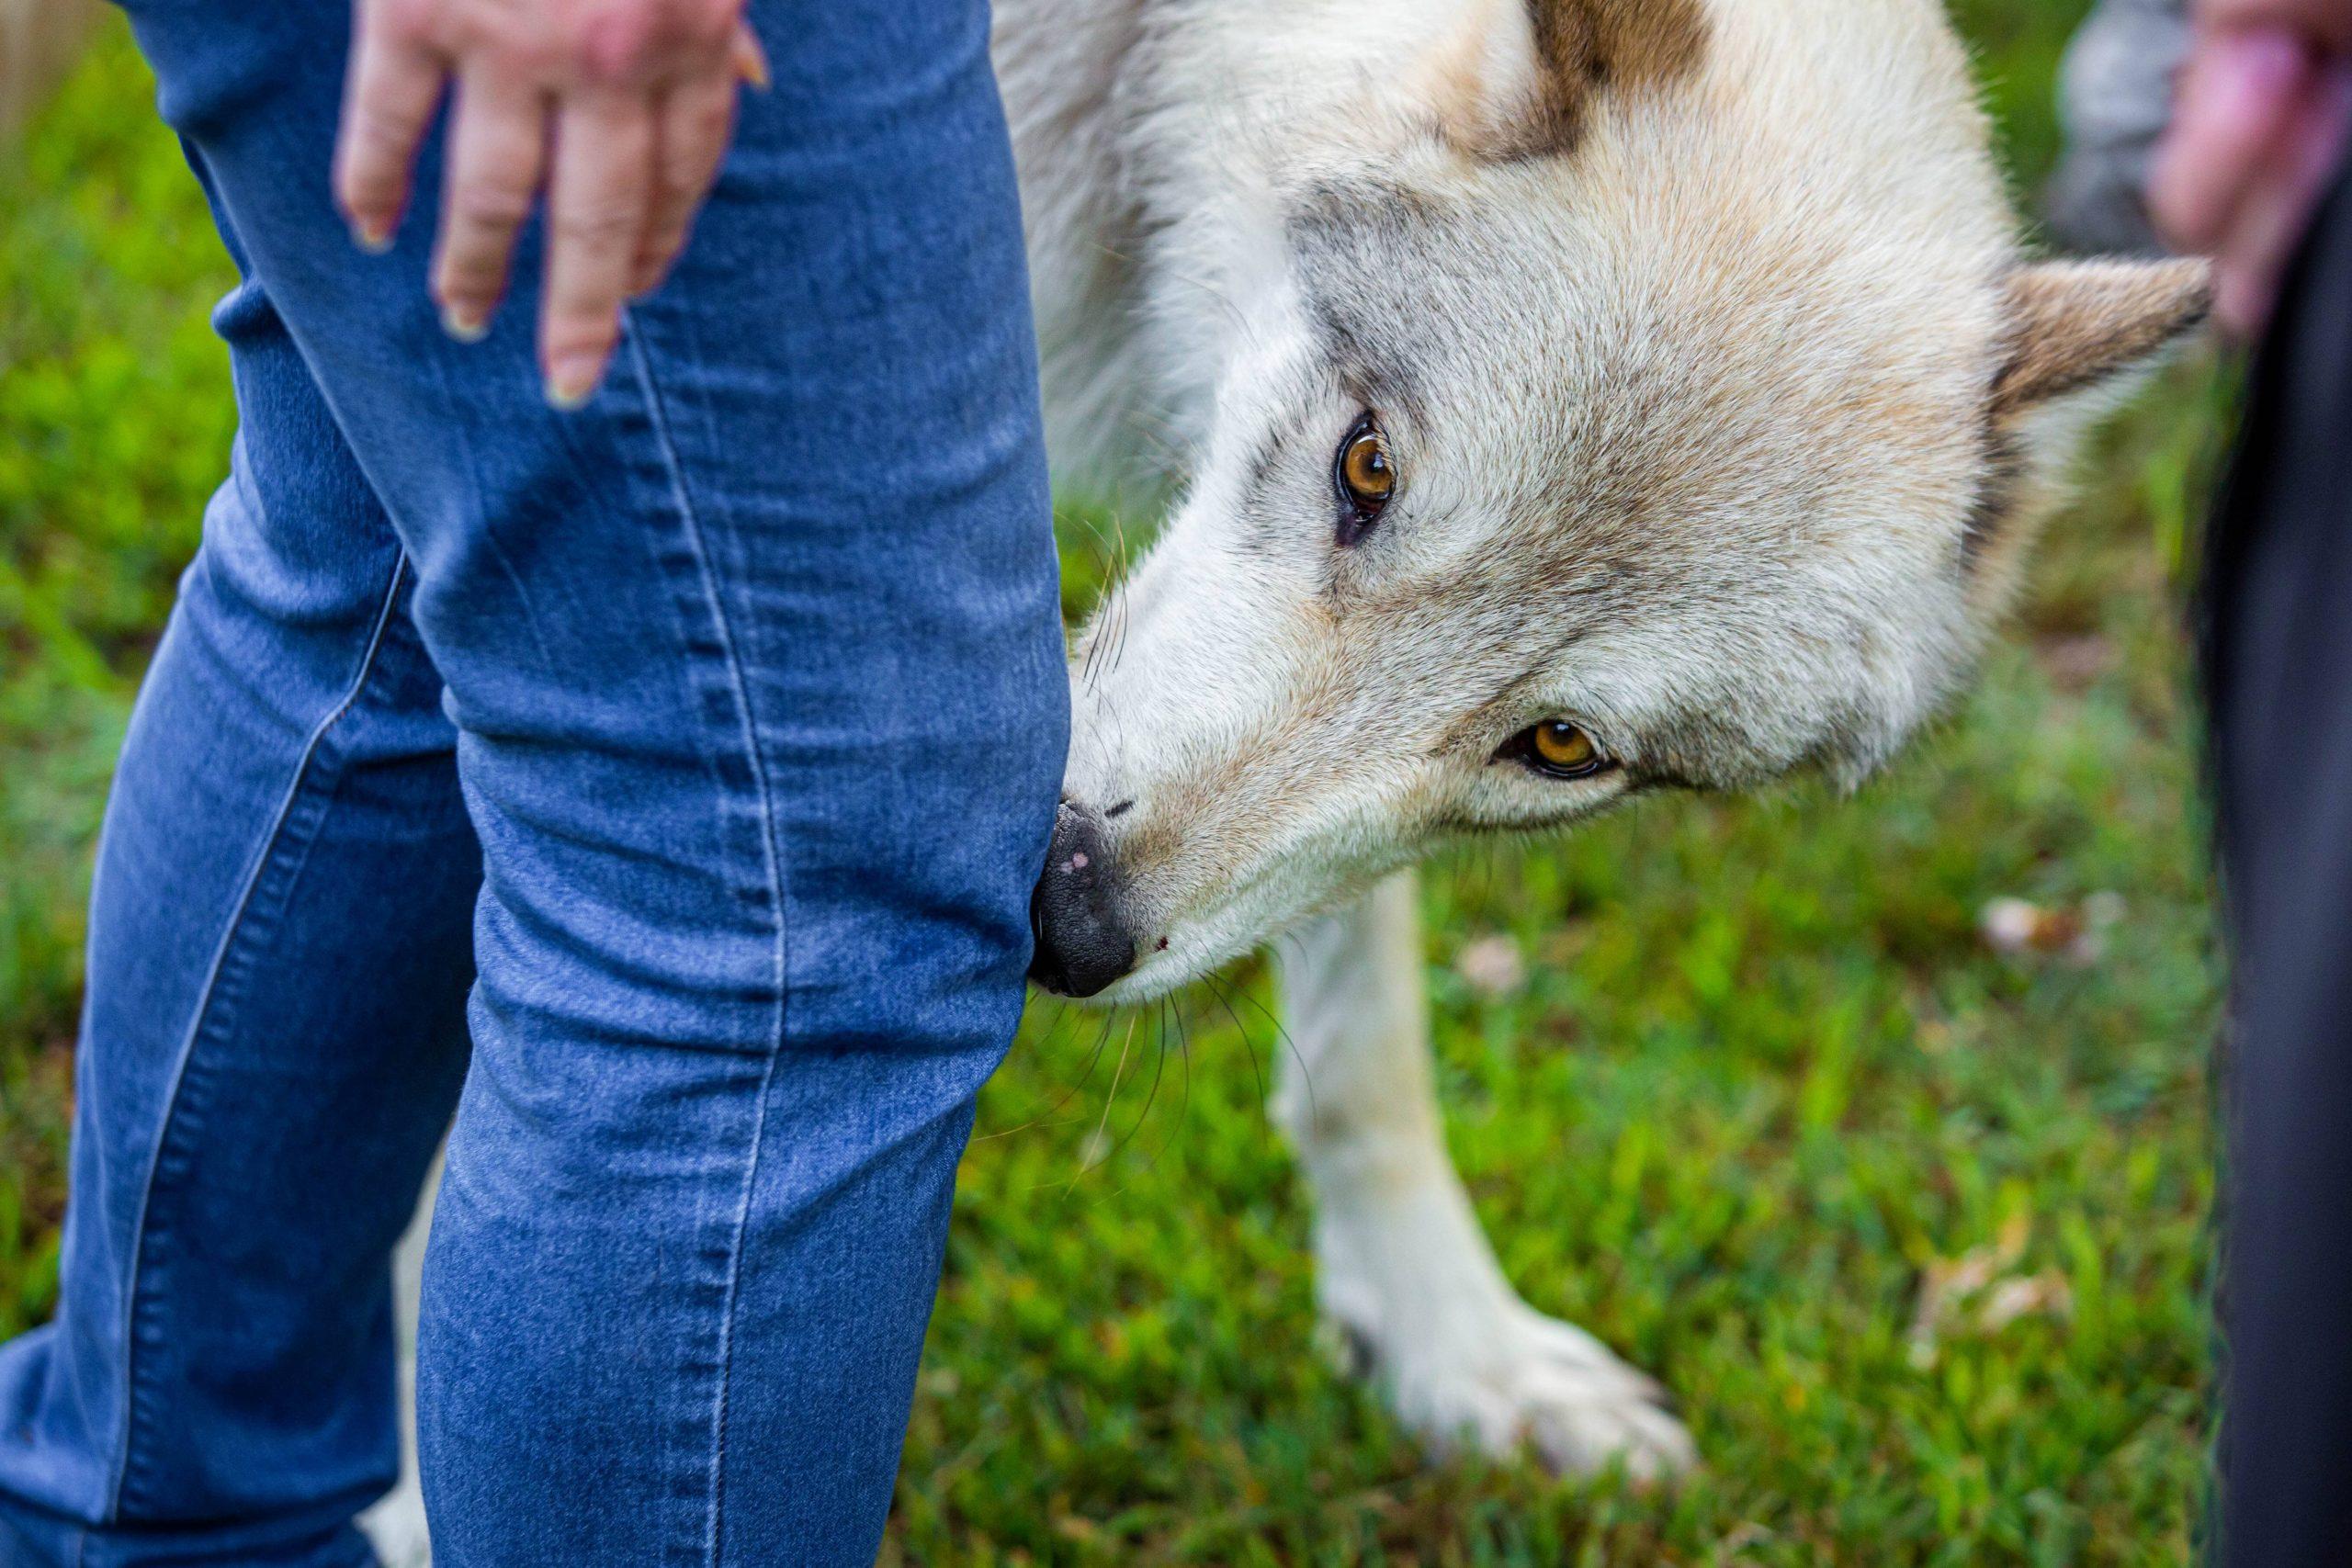 Dogs revolutionize disease detection